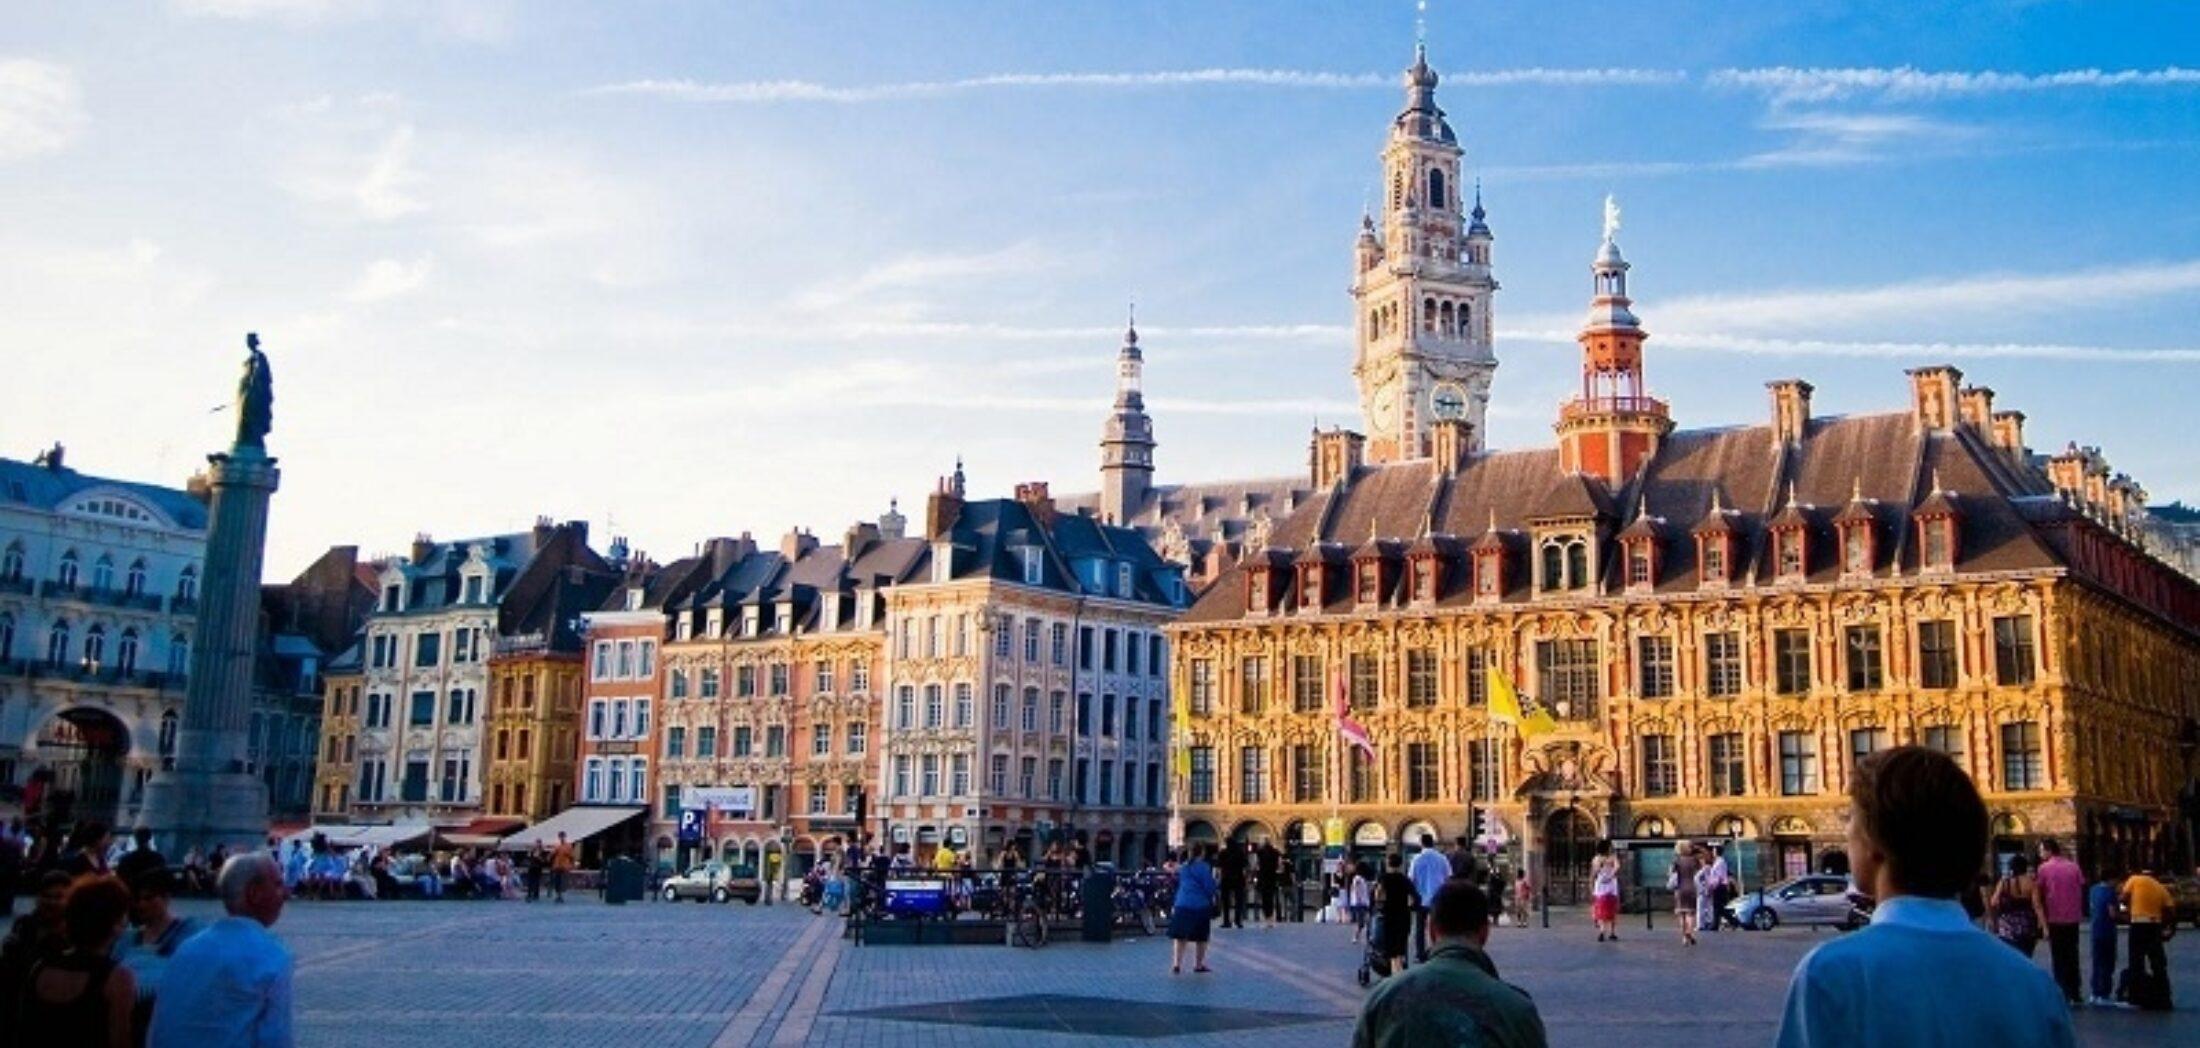 Hero image for Lille Event 3 dagen: Vrienden, Teamgenoten & collega's 4/18 personen